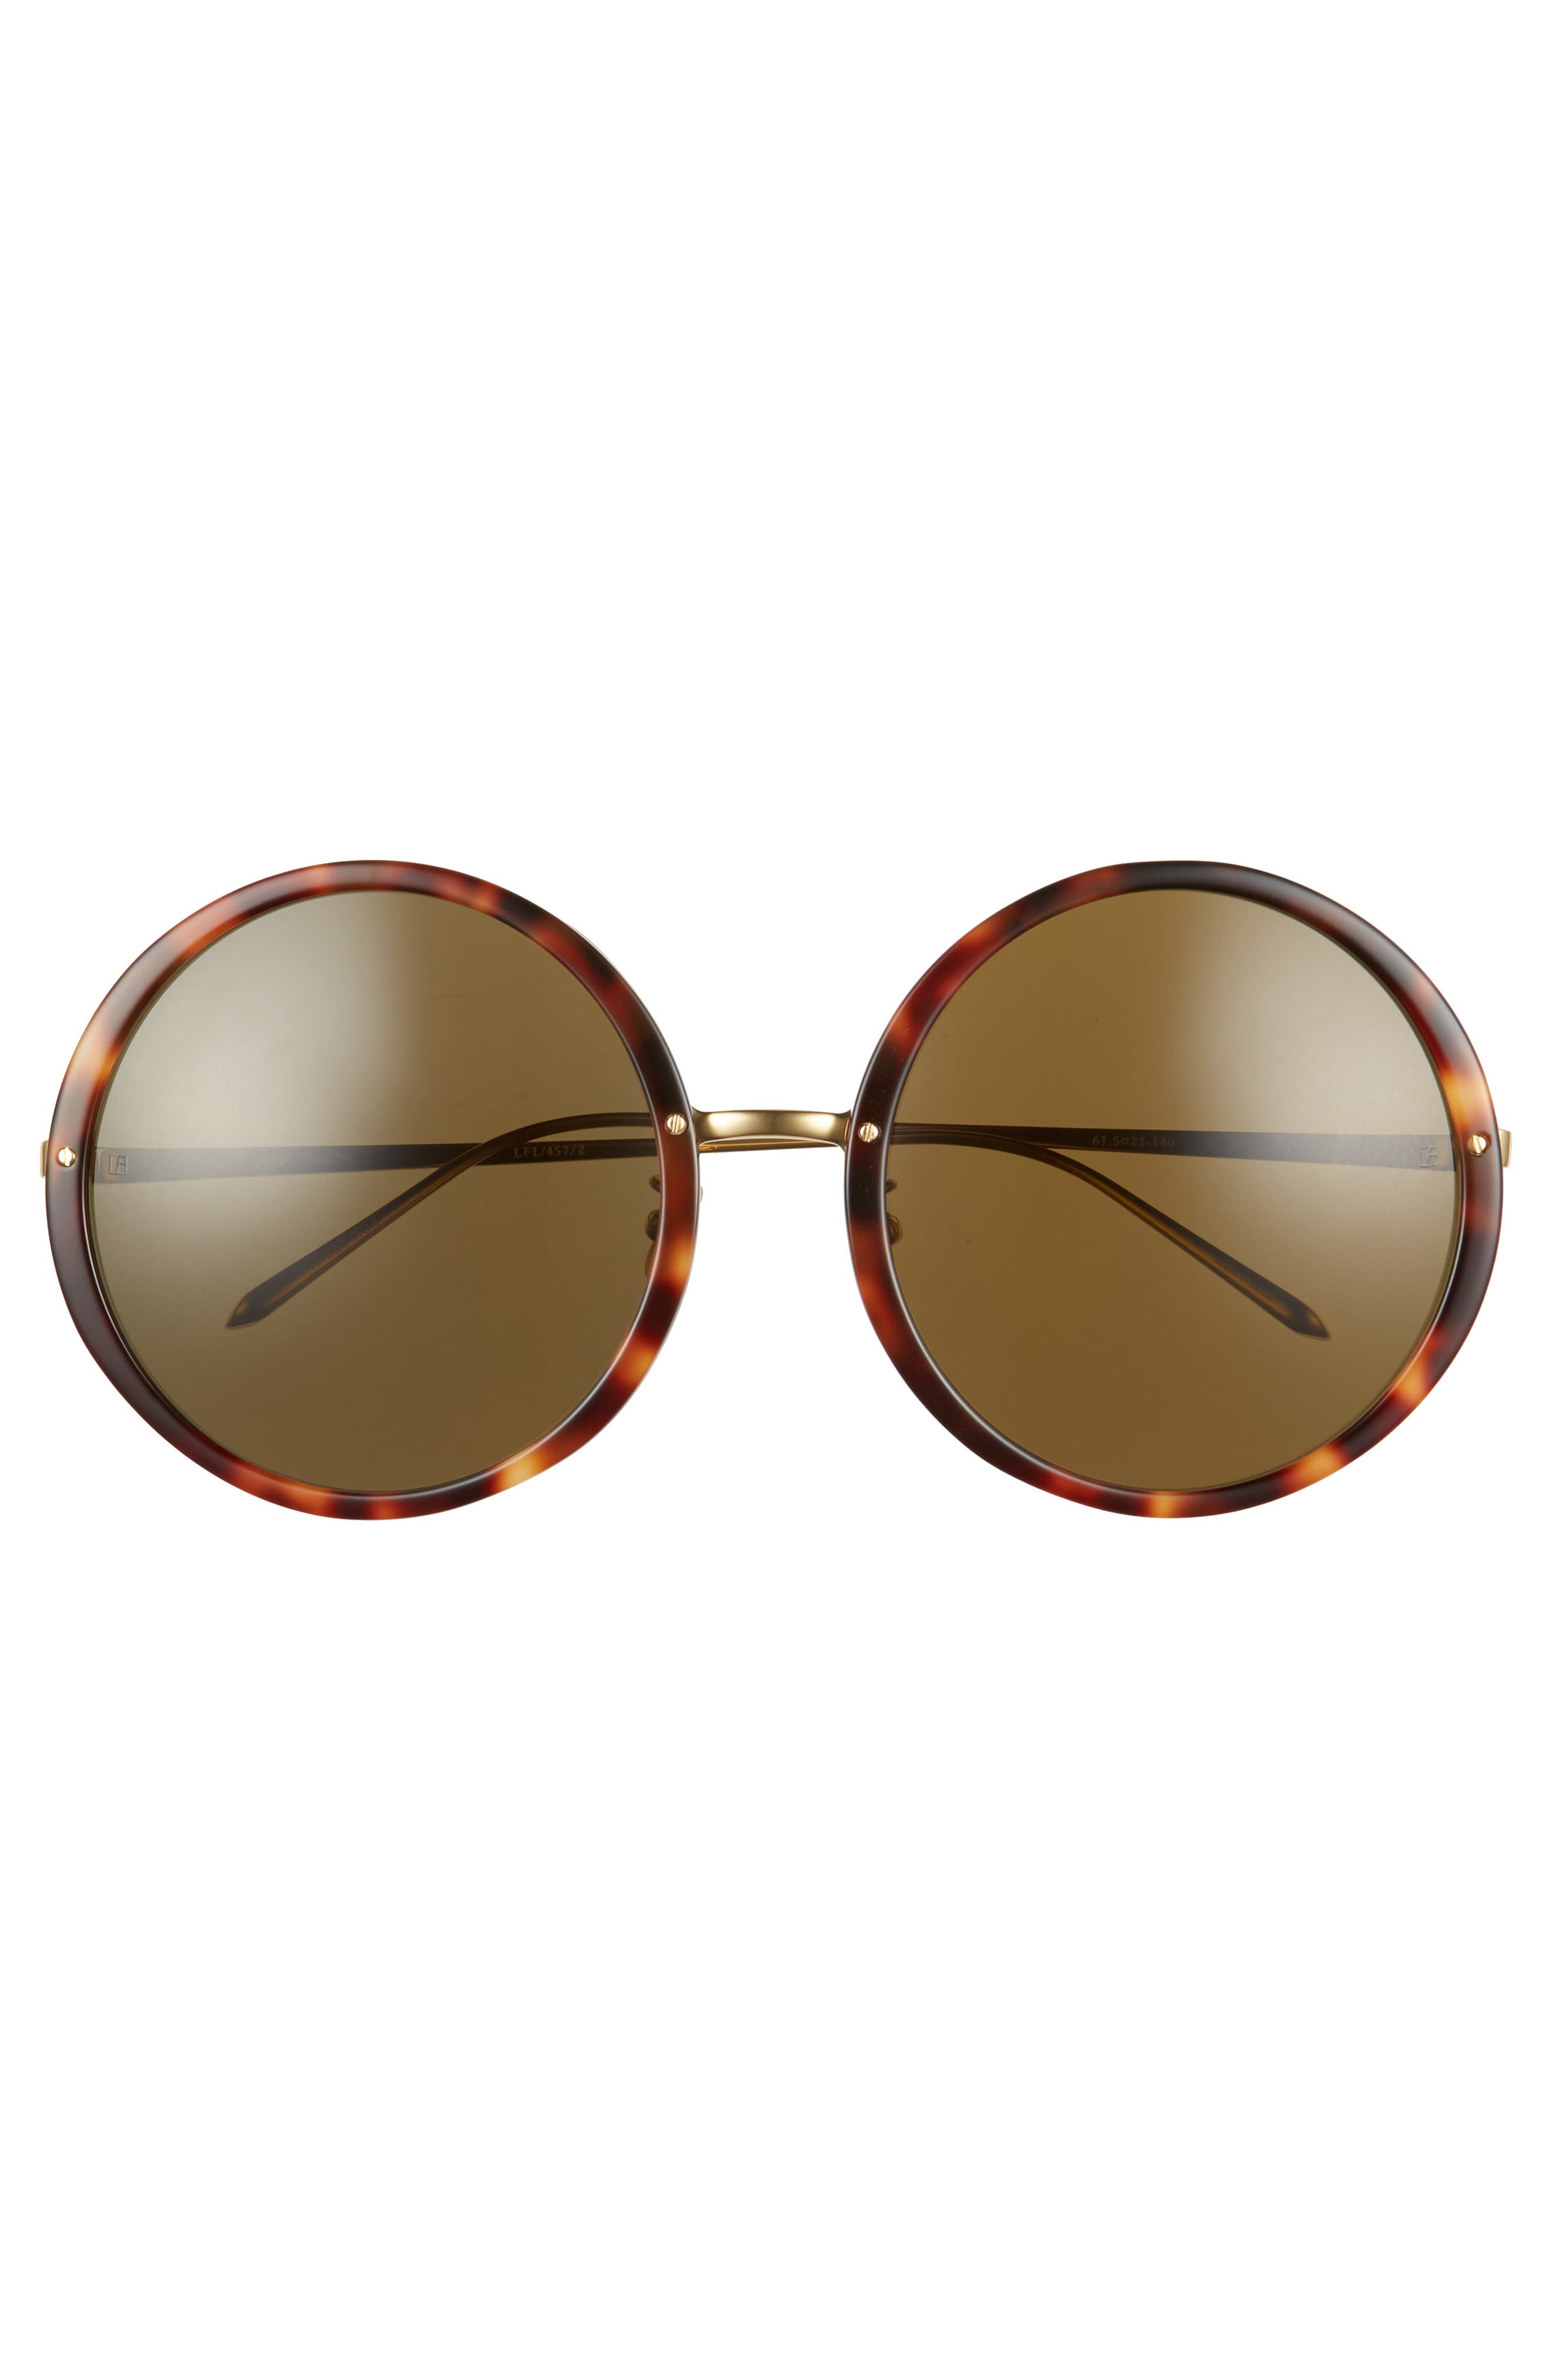 61mm Round 18 Karat Gold Trim Sunglasses,                             Alternate thumbnail 3, color,                             Tortoise/ Yellow Gold/ Brown